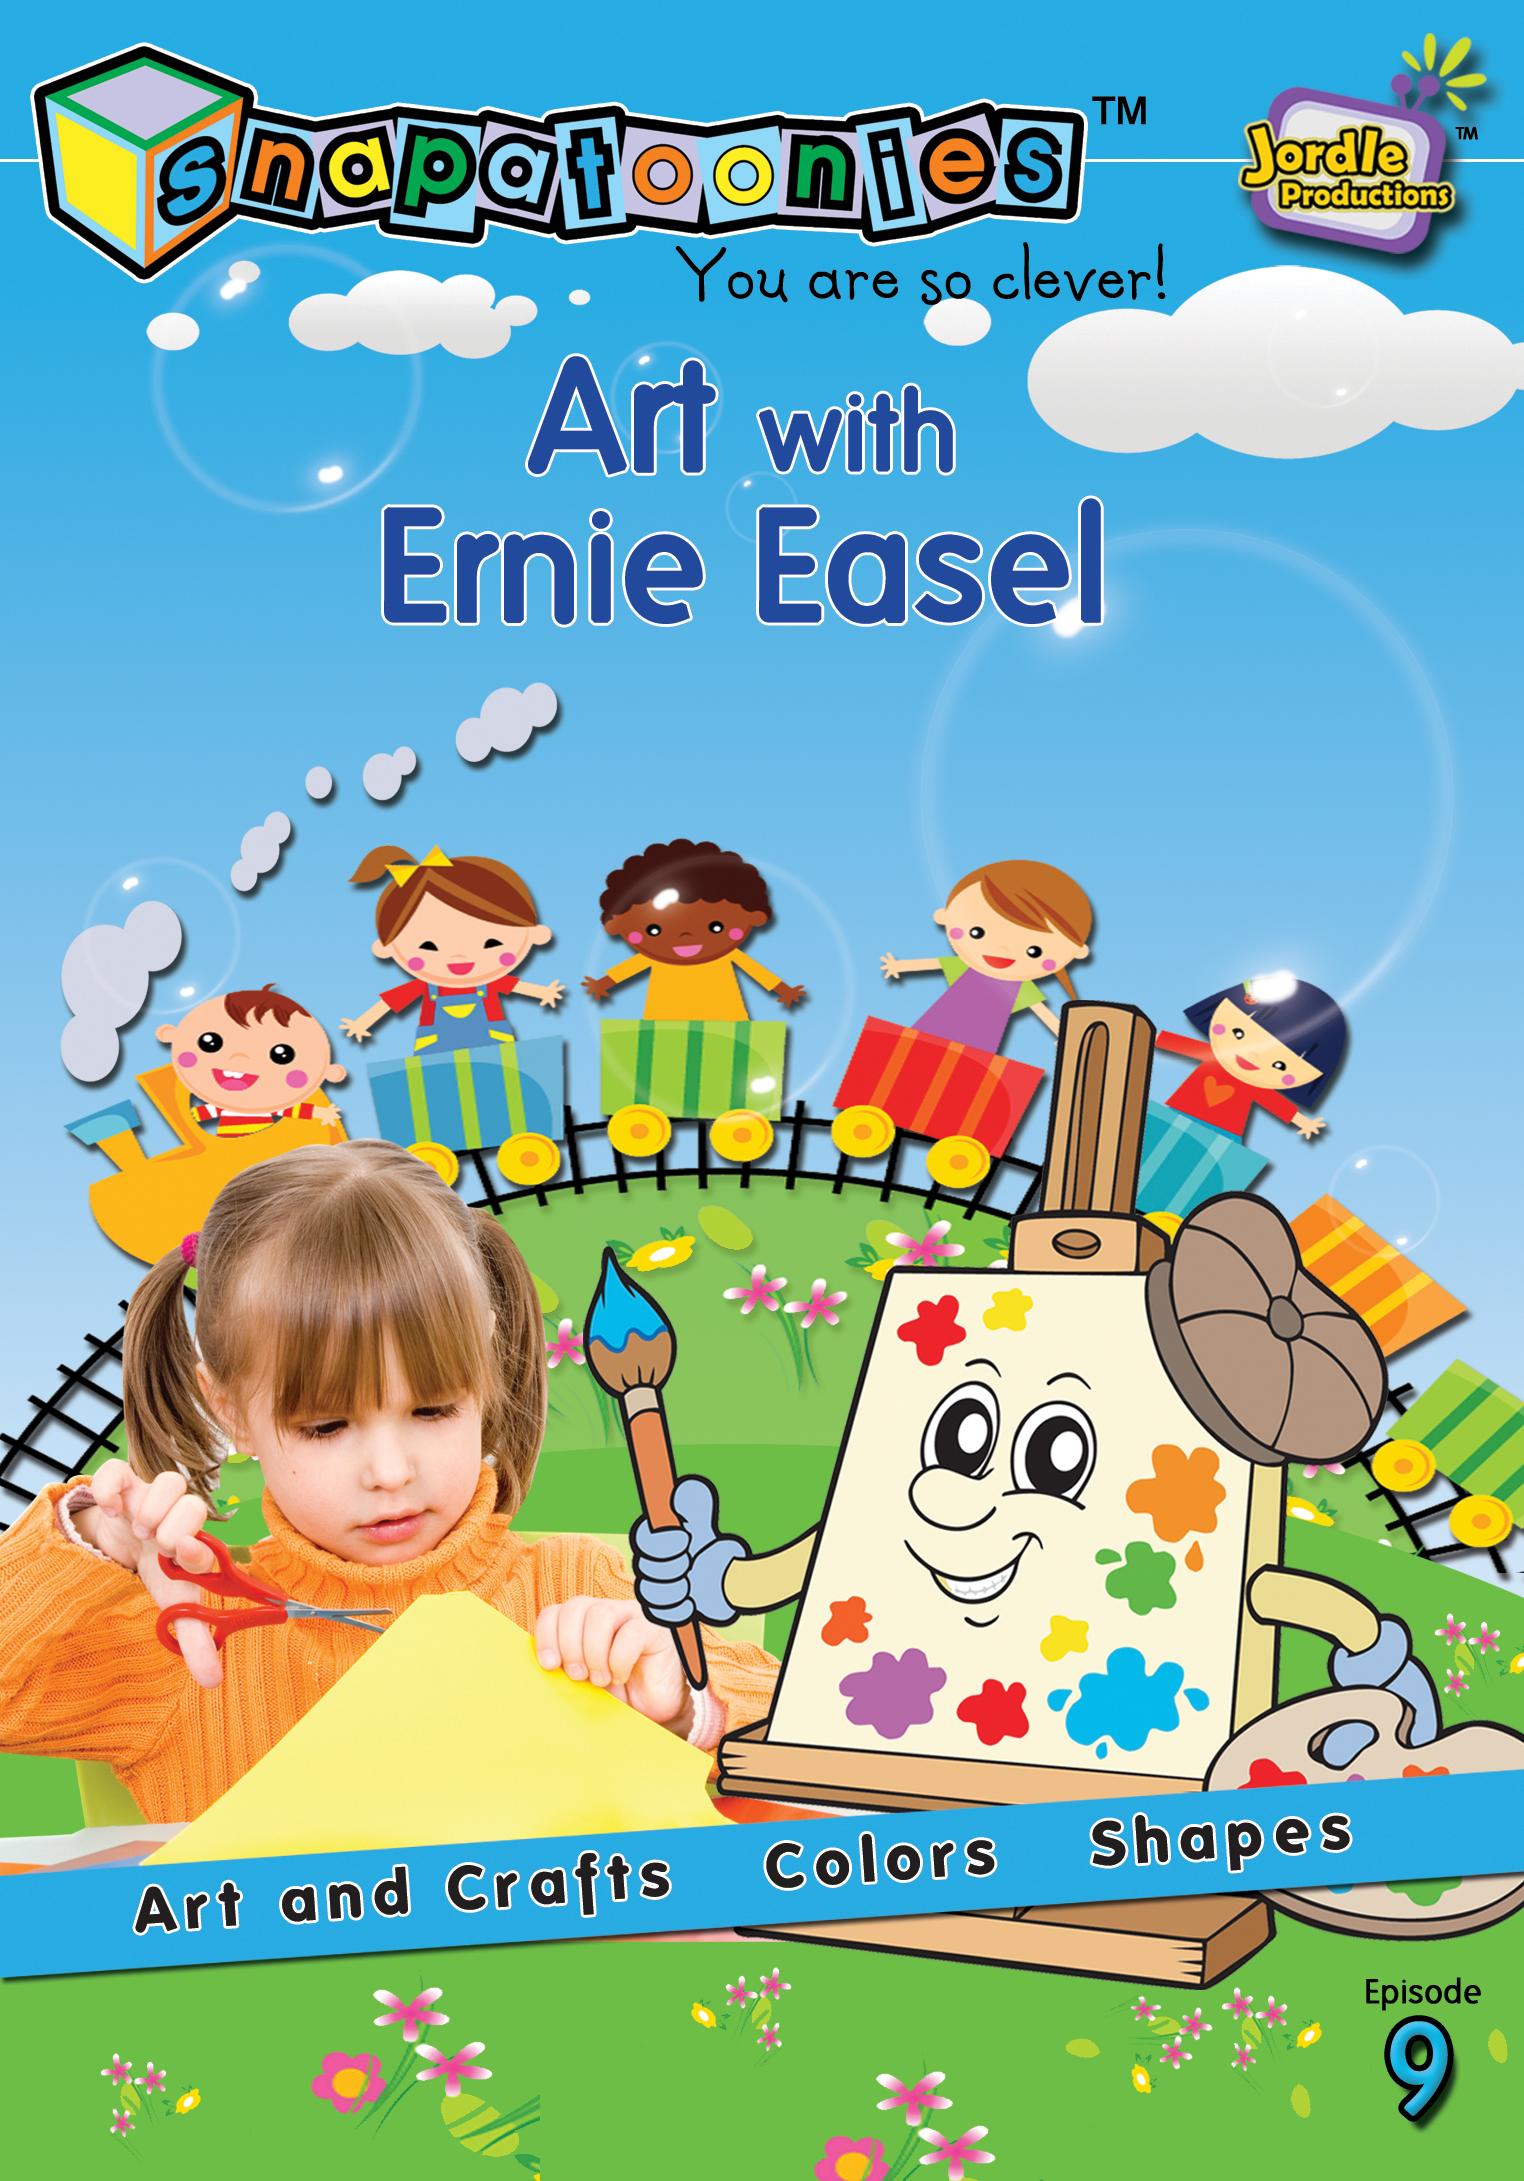 Snapatoonies Art with Ernie Easel